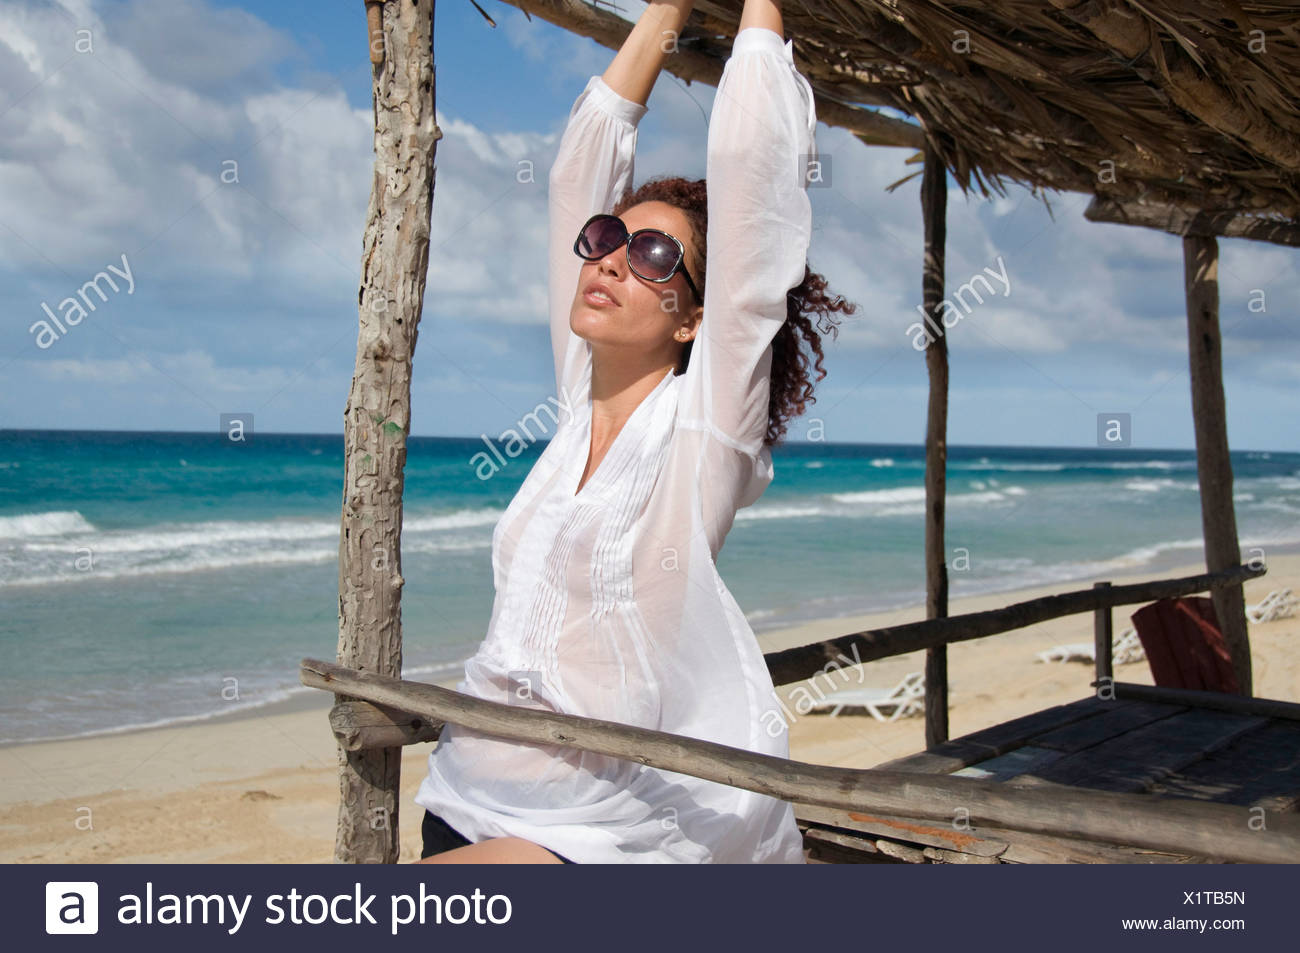 Junge Frau unter Sonnenschirm, Havanna, Kuba Stockbild